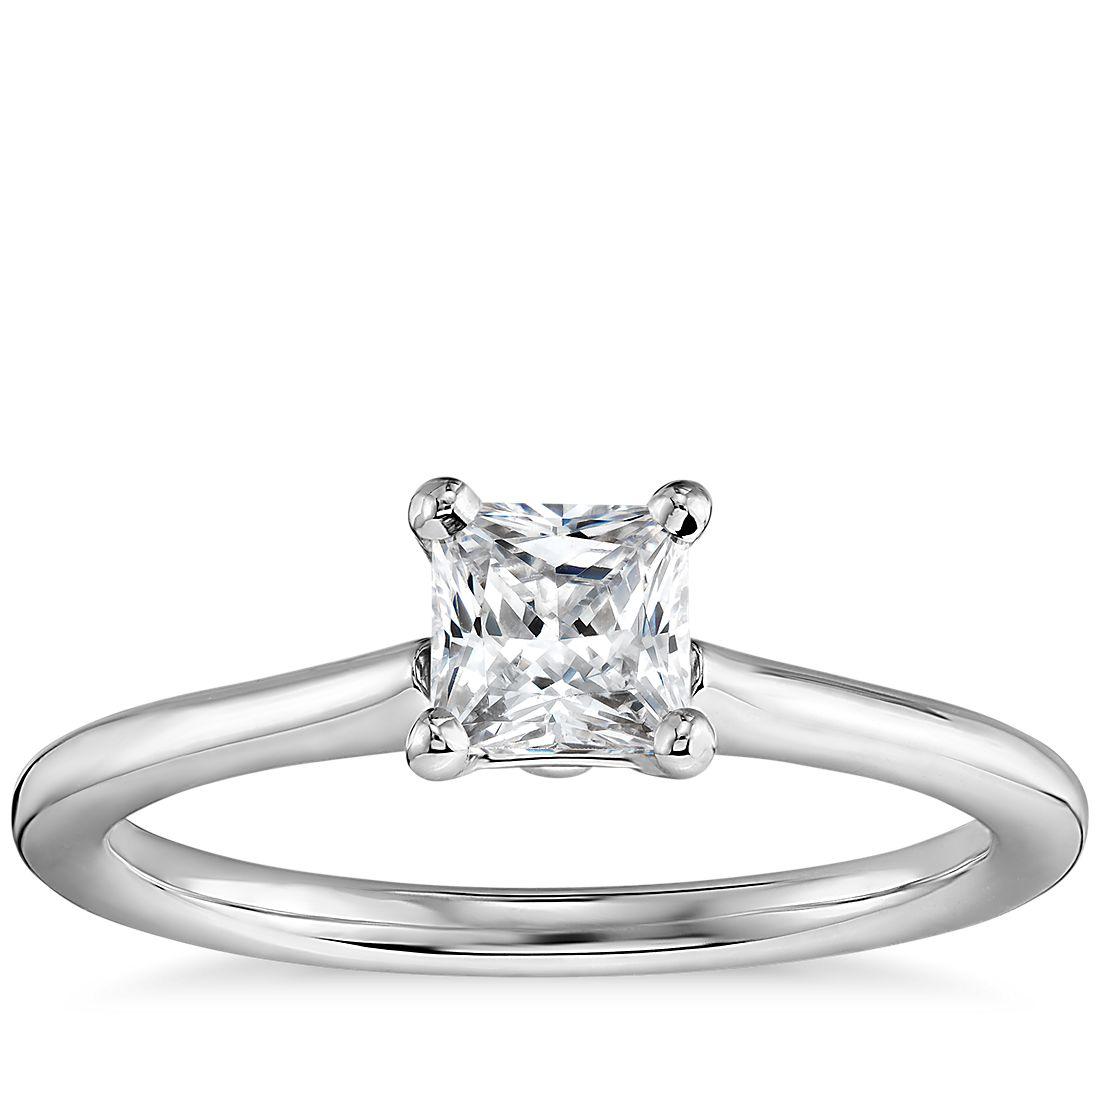 1/2 Carat Preset Princess-Cut Petite Solitaire Engagement Ring in 14k White Gold